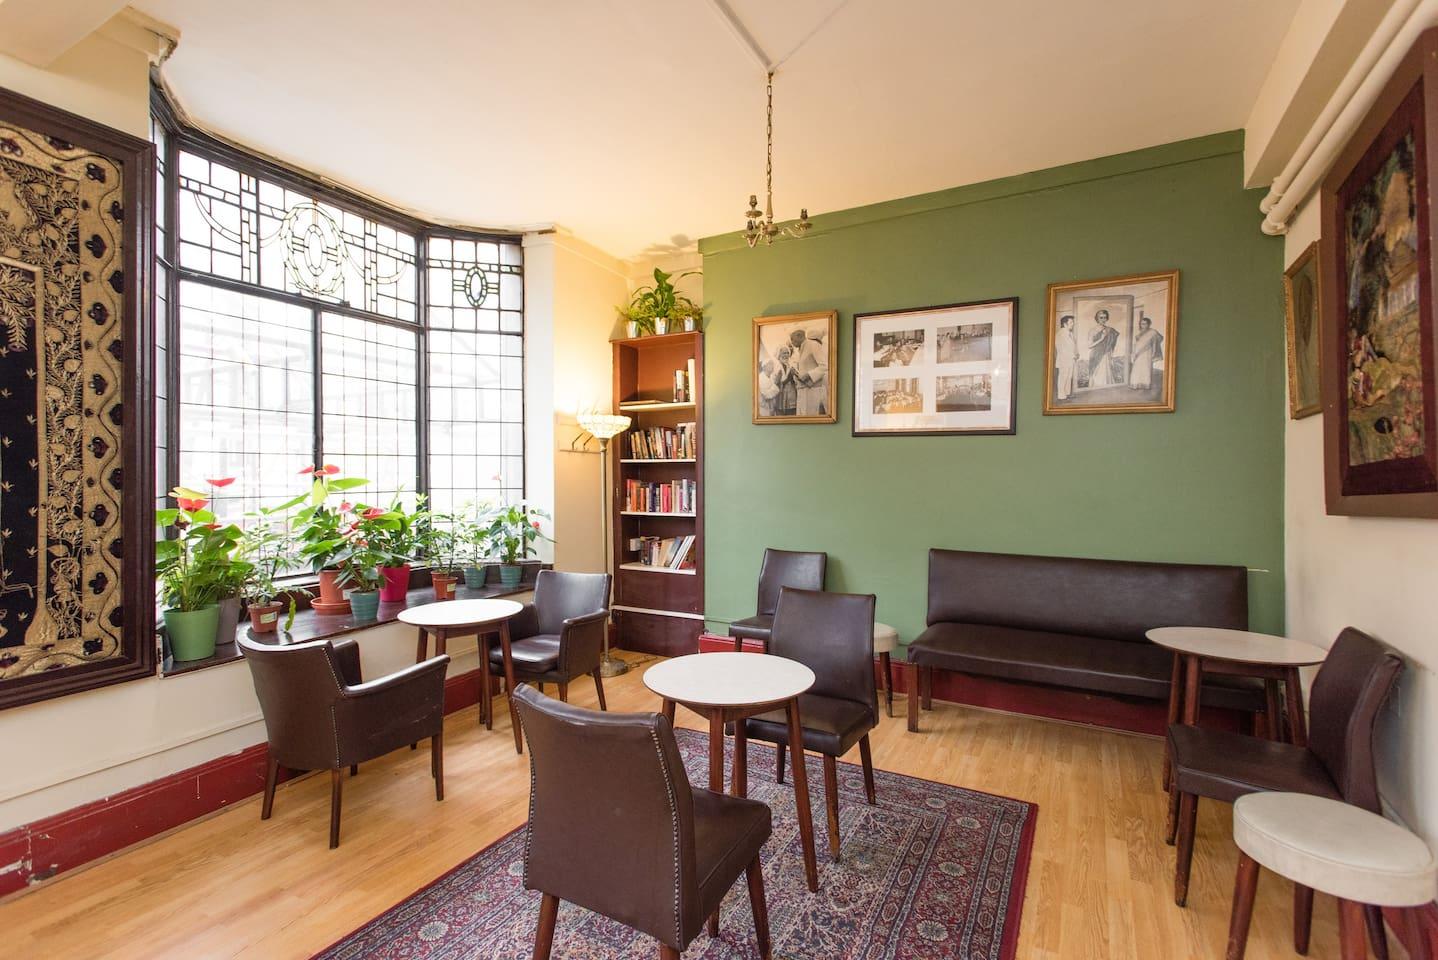 Breakfast room (continental breakfast included)